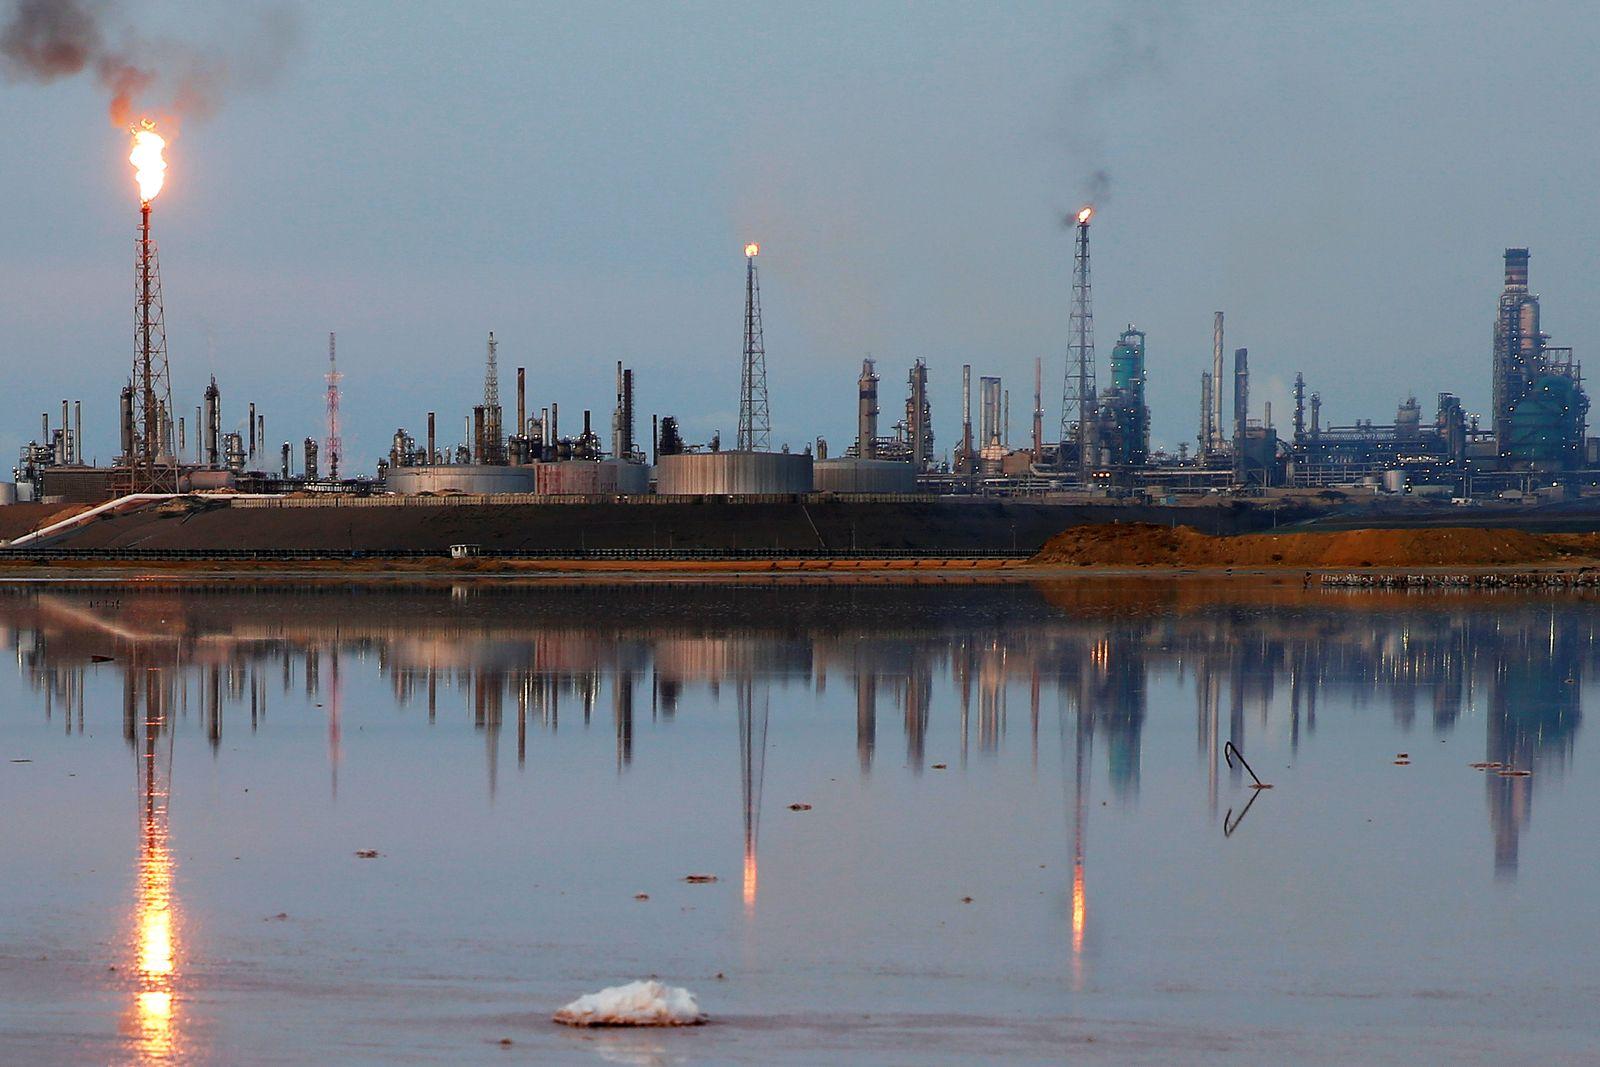 Venezuela / Öl / Russland / Maduro / Setschin / OIL-PDVSA/CITGO